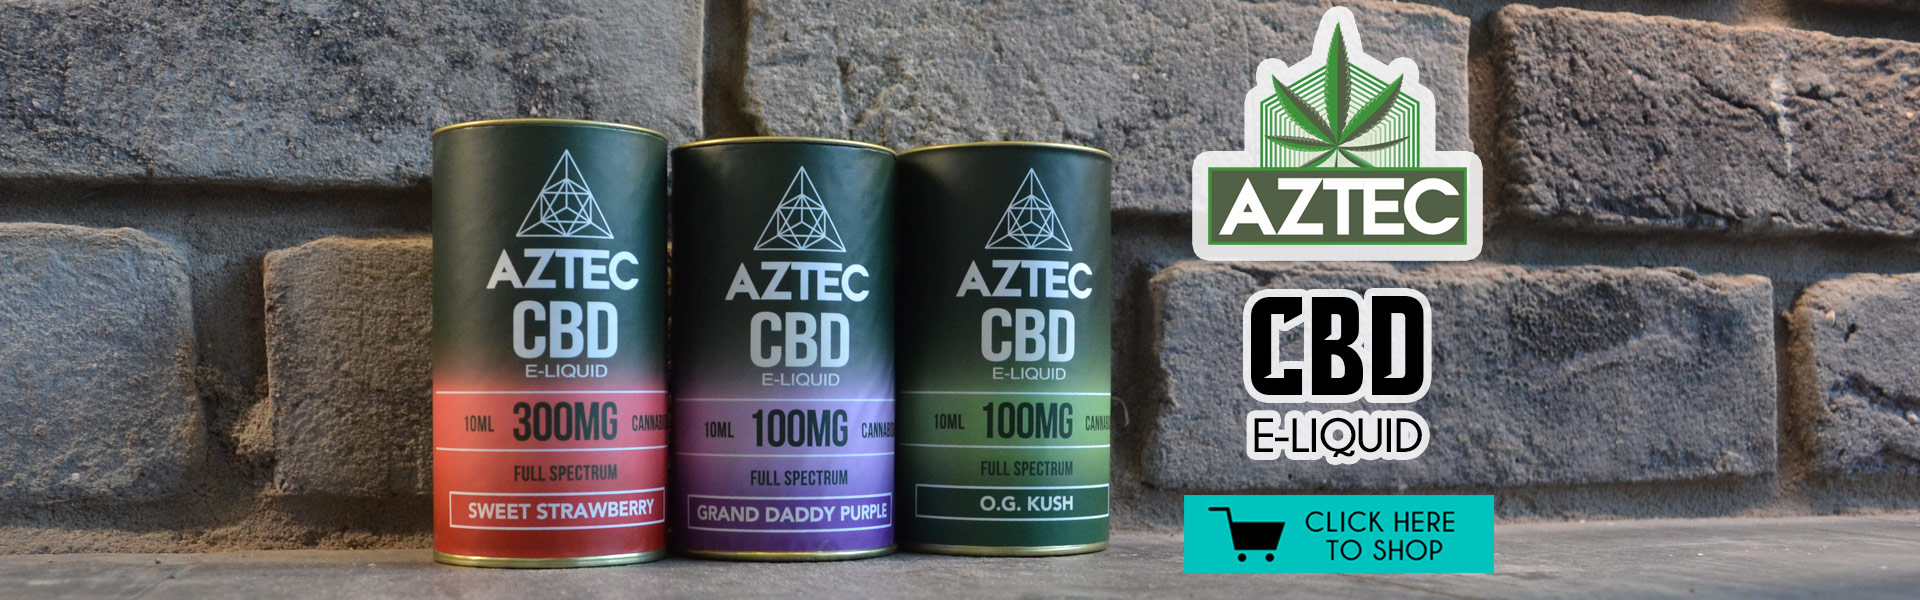 Aztec CBD